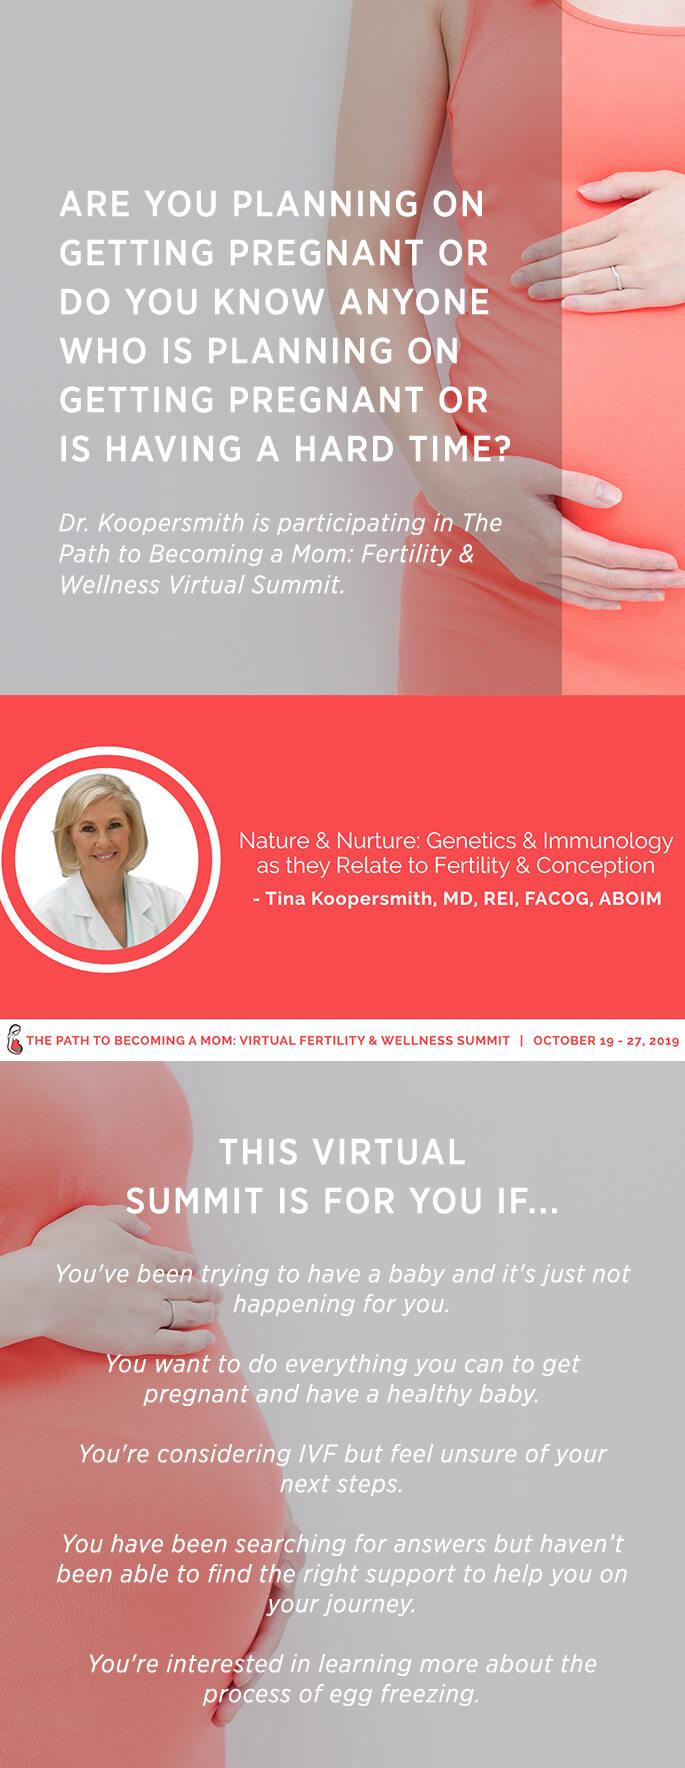 Fertility & Wellness Virtual Summit 2019